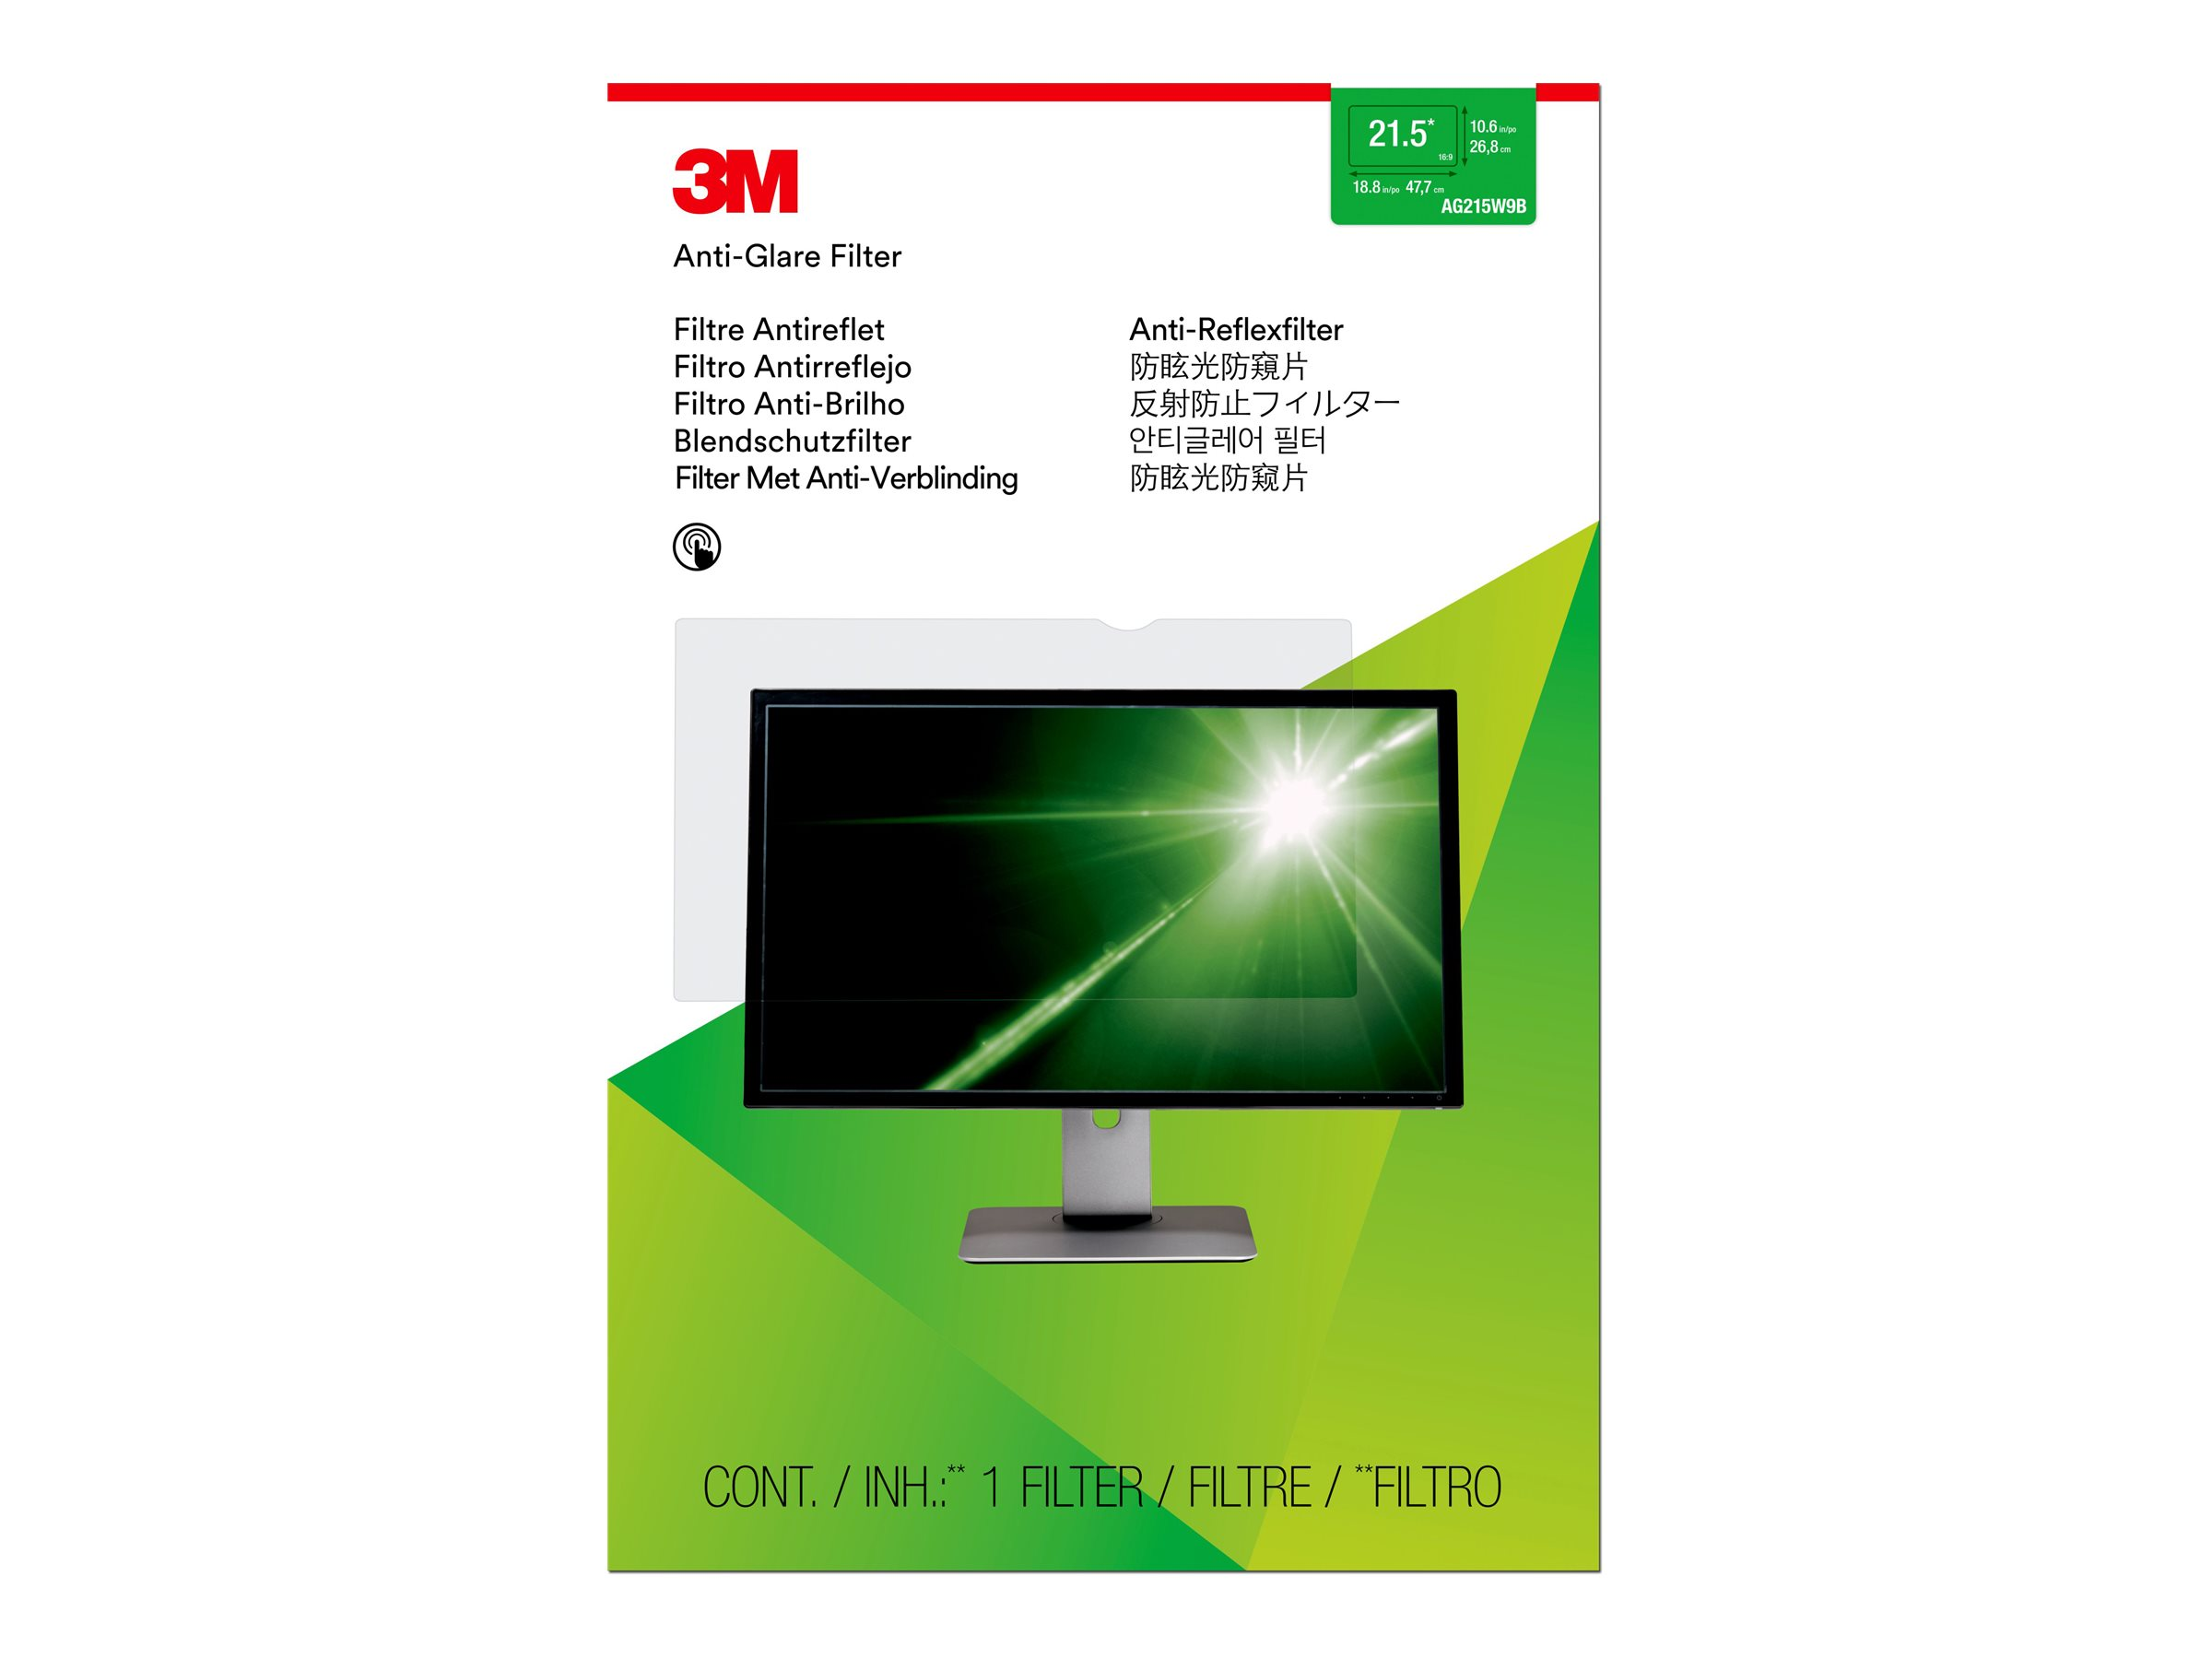 3M Anti-Glare Filter for 21.5